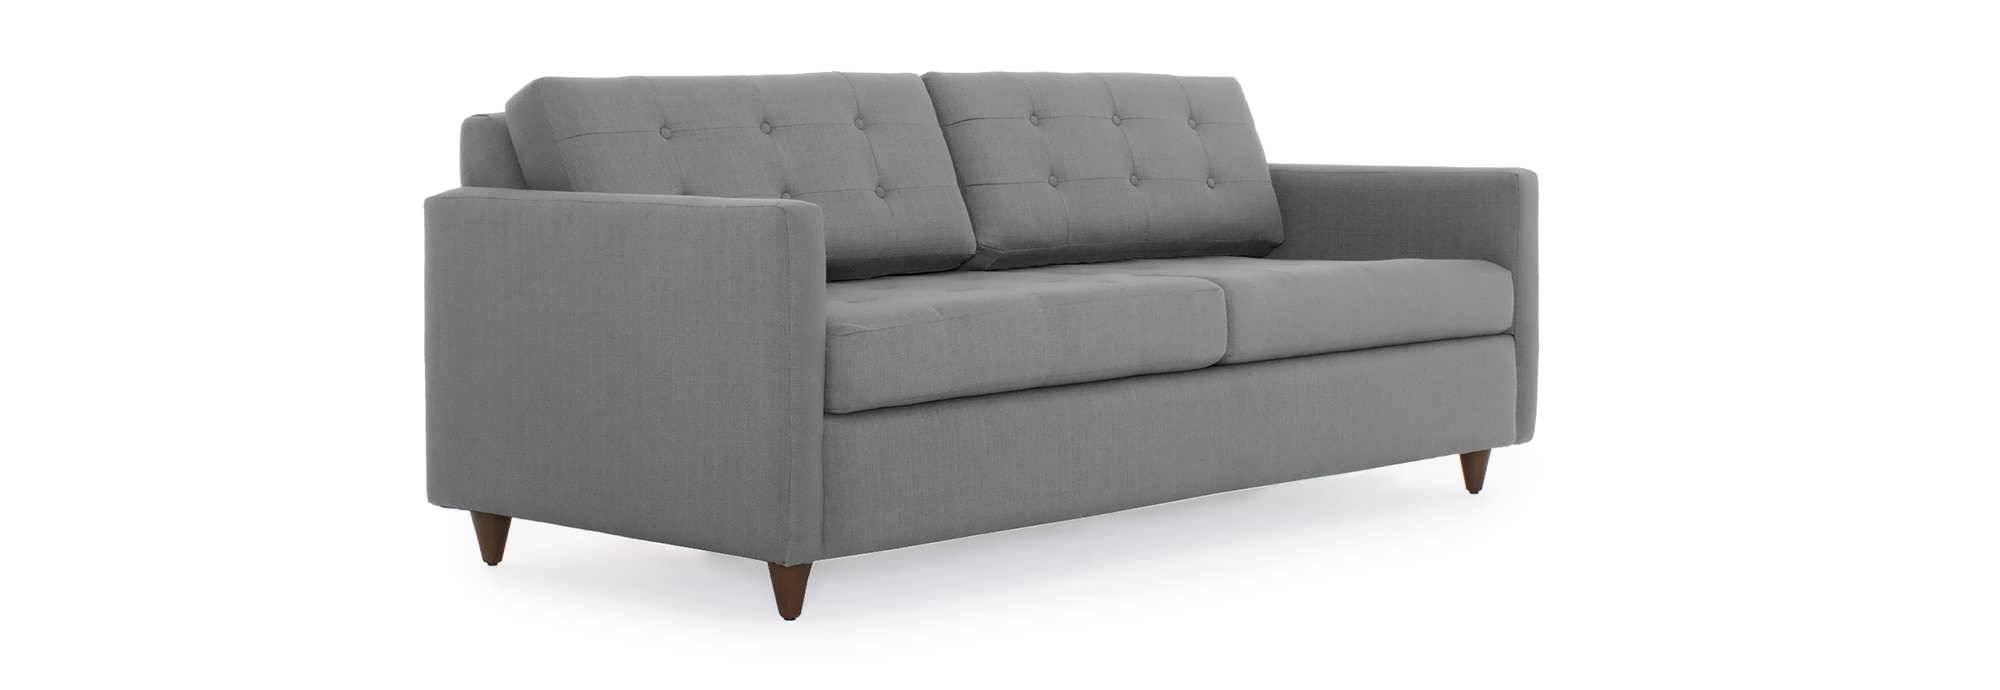 Sofa : Sofa And Chair 81 Inch Sofa Shallow Sofa Large Seat Depth with Narrow Depth Sofas (Image 12 of 15)